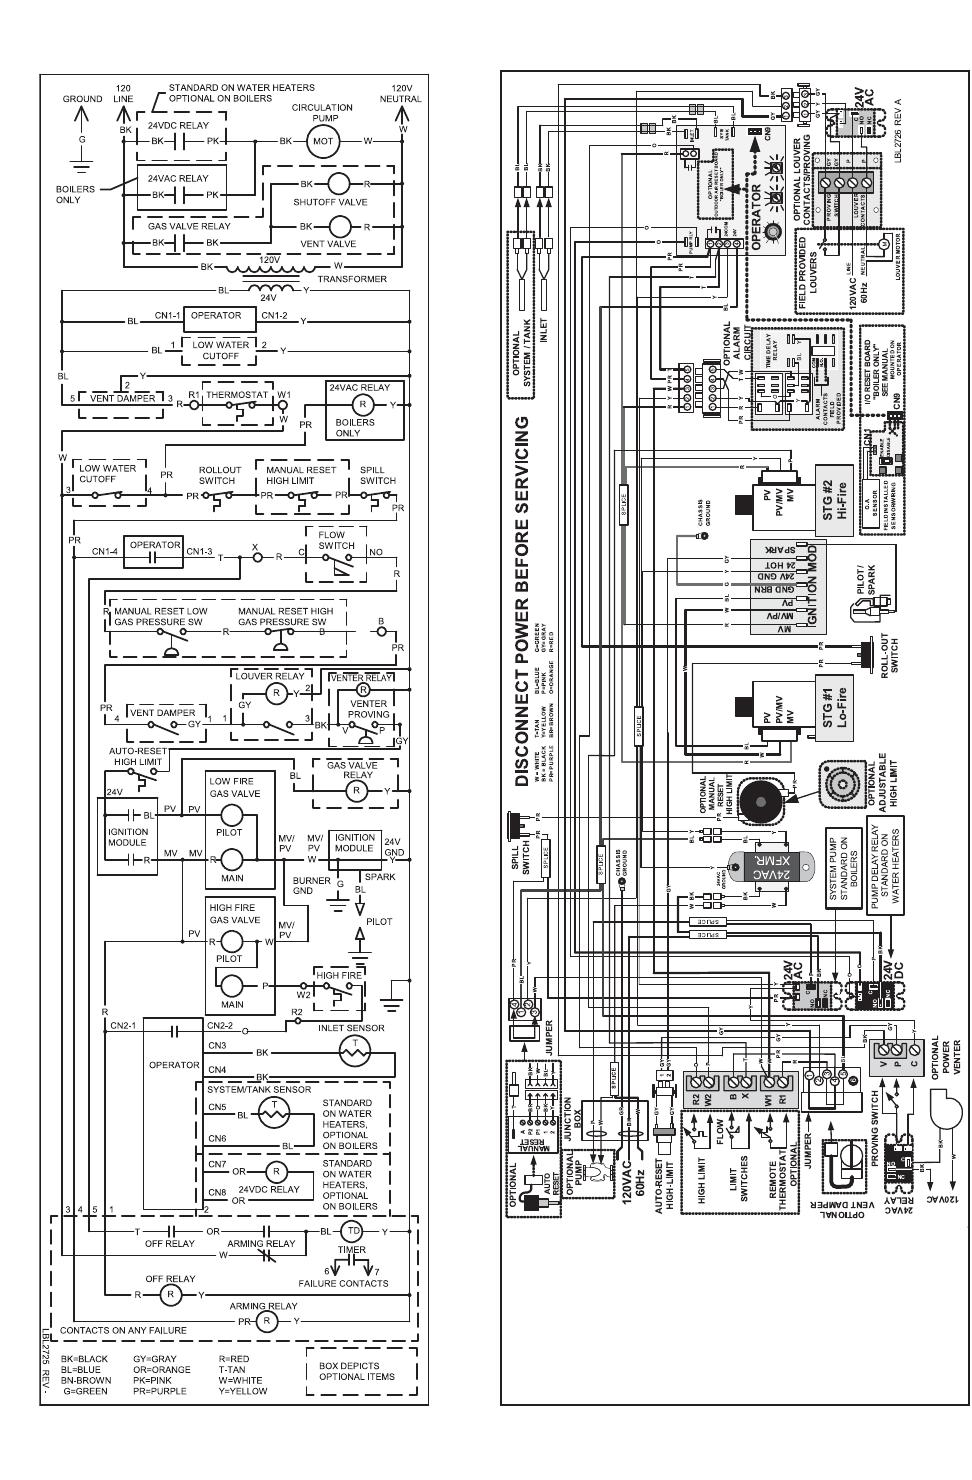 medium resolution of lochinvar schematic diagram f9 m9 unit 500 000 btu hr models wiring diagram f9 m9 unit 500 000 btu hr models